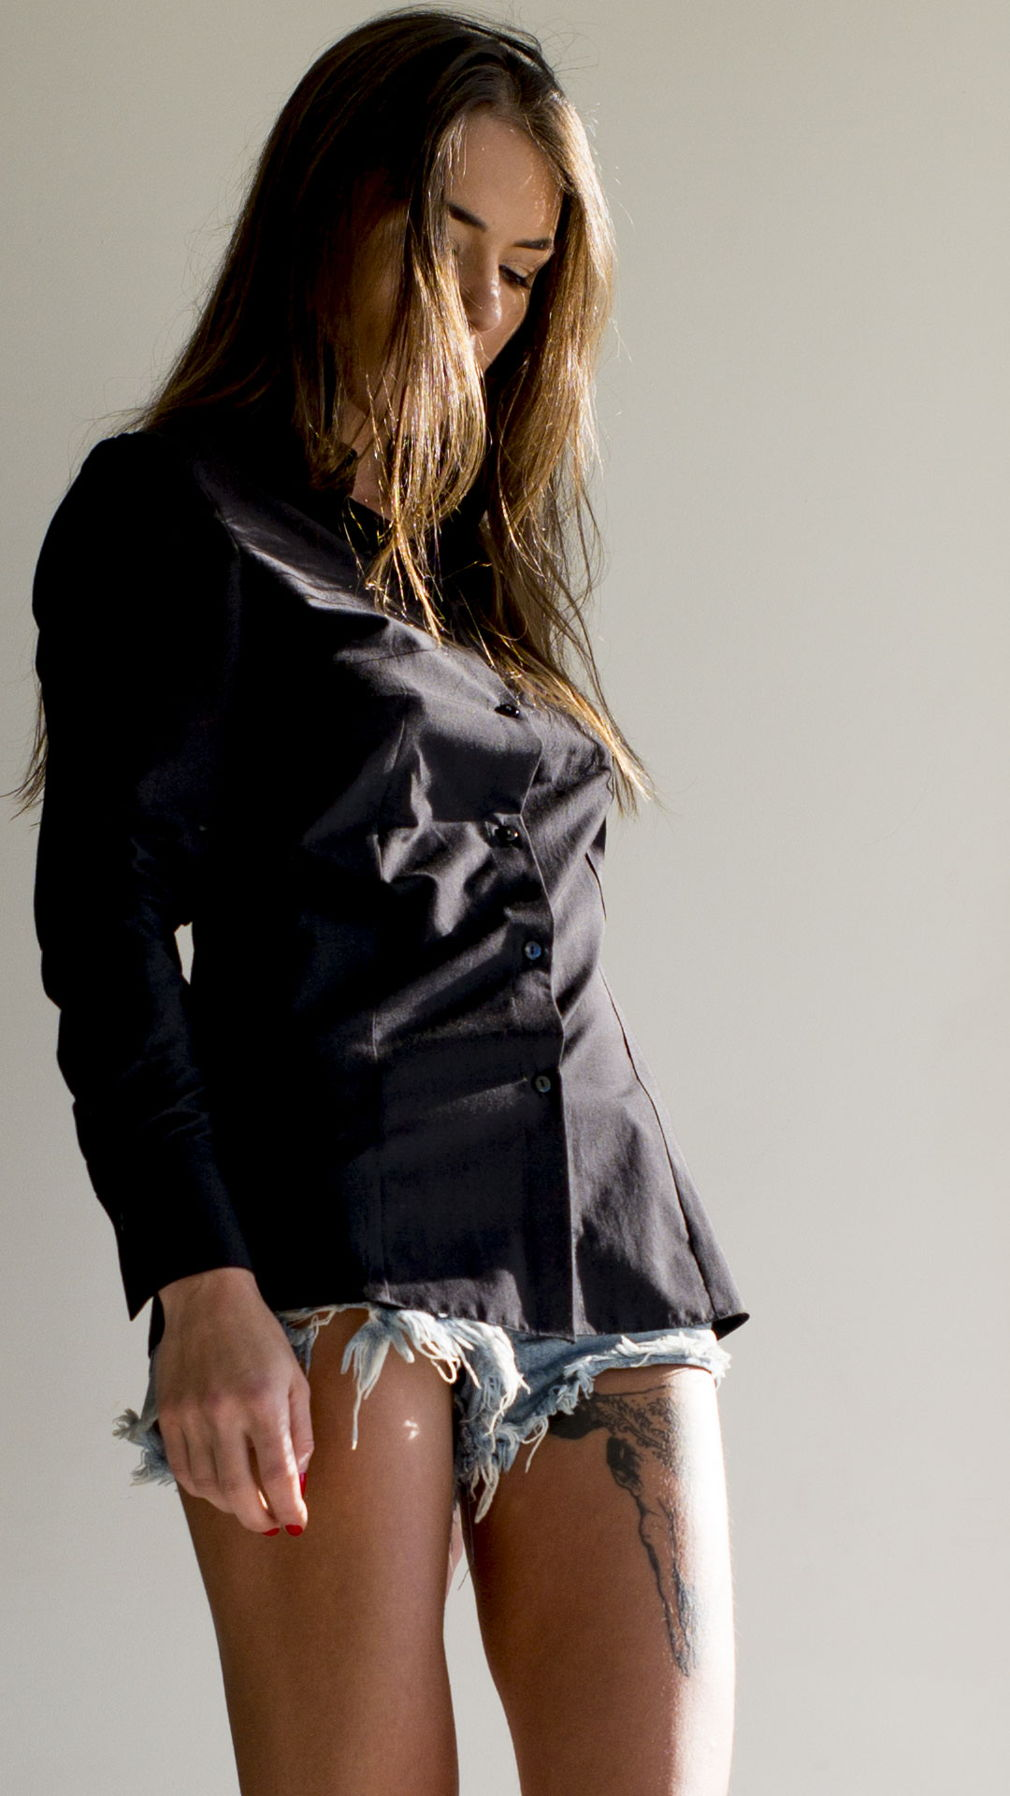 Simple black shirt